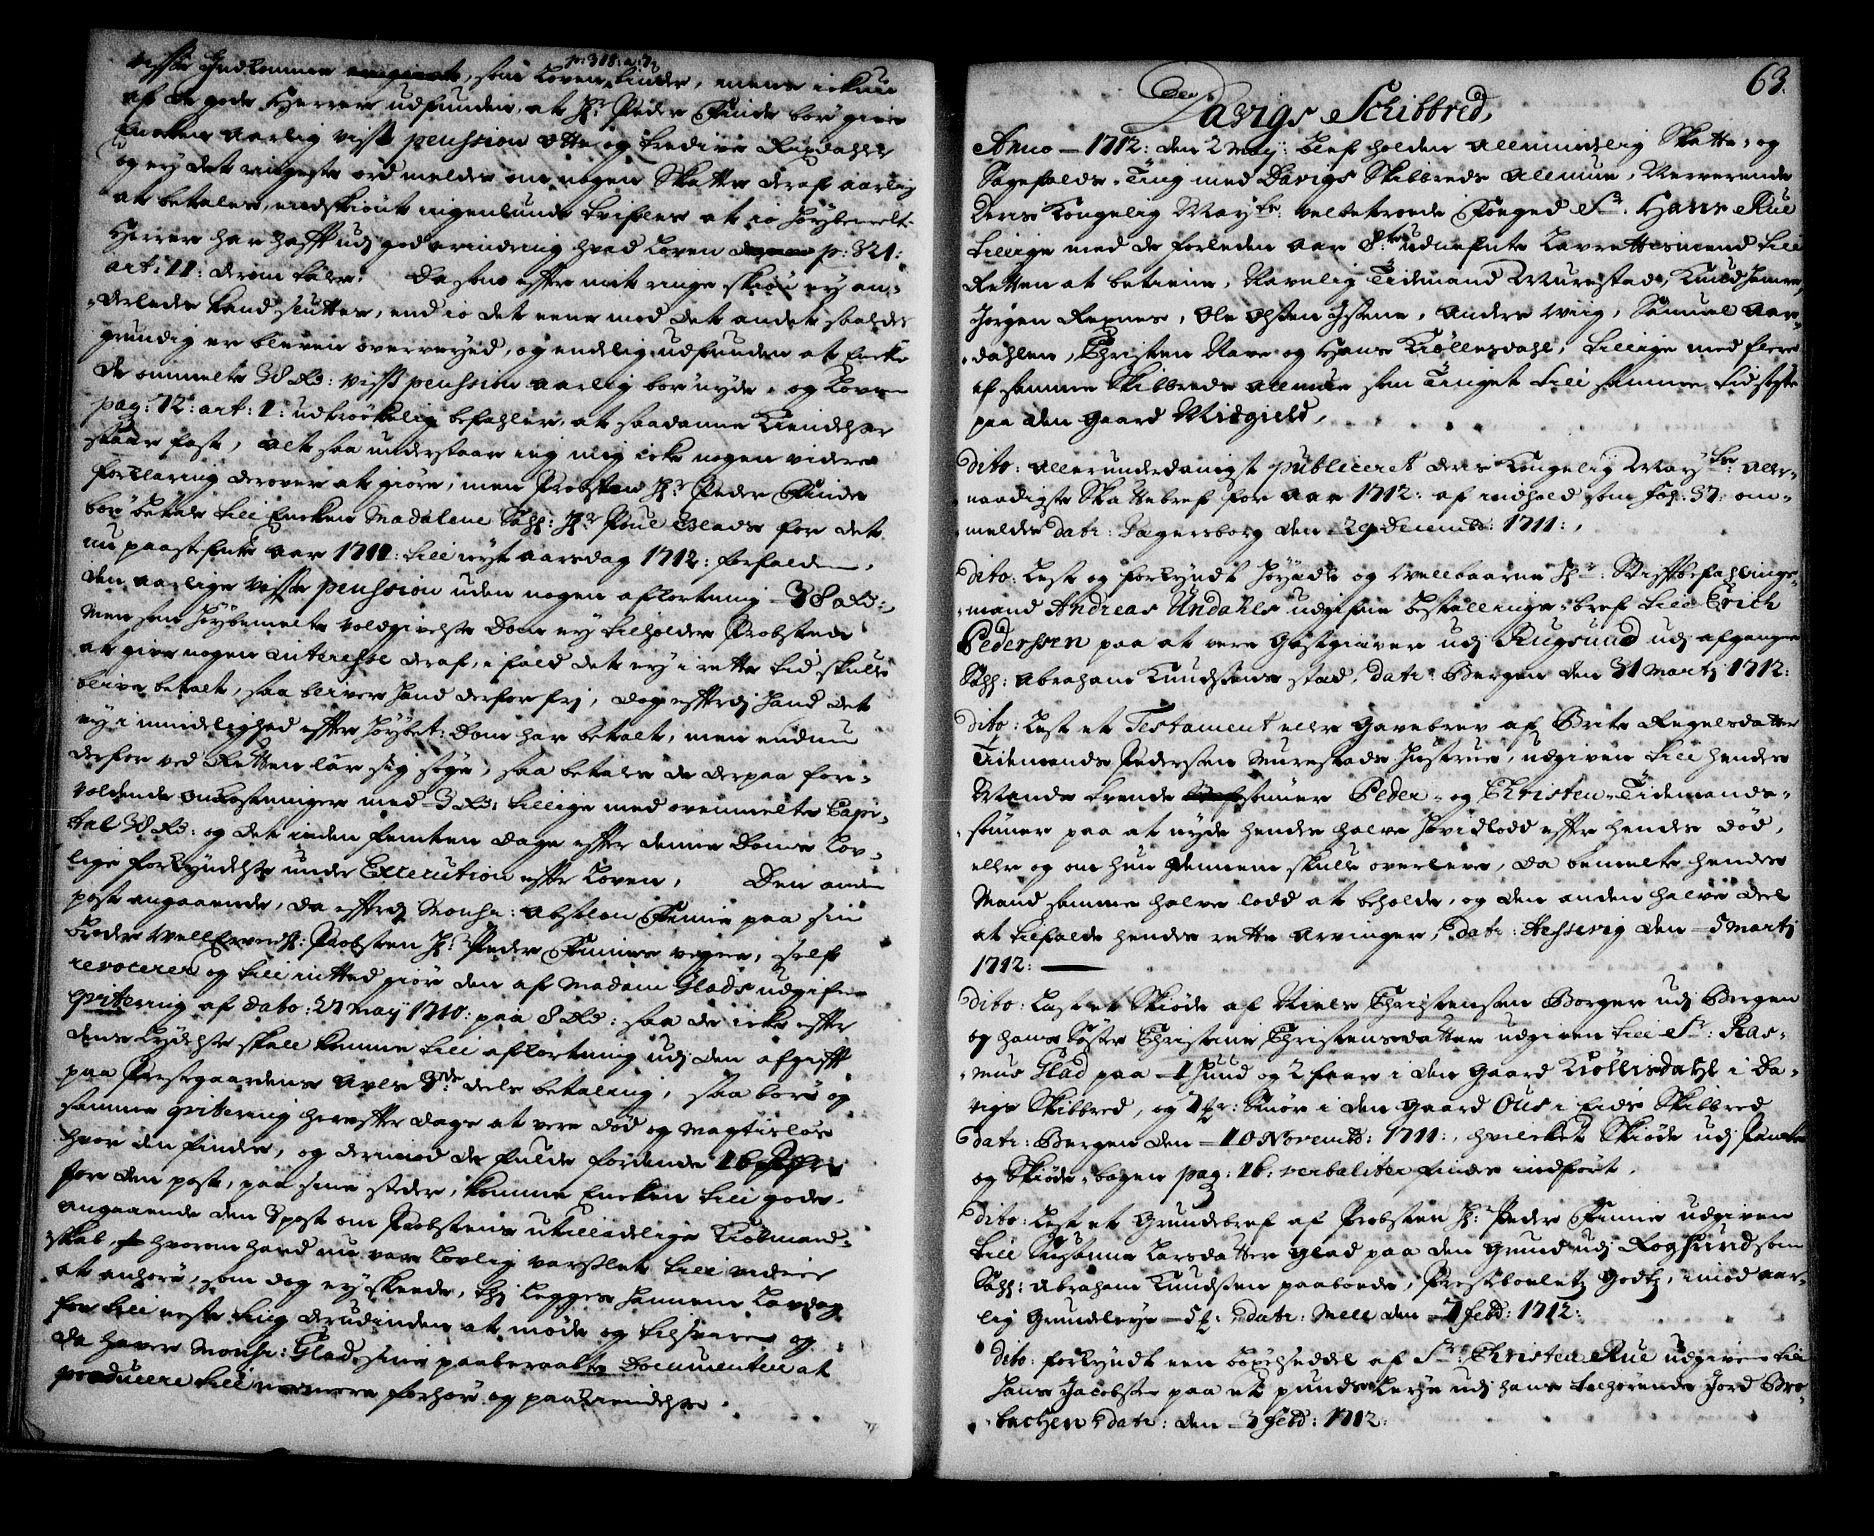 SAB, Nordfjord sorenskriveri, 01/01a/L0018: Tingbøker (justisprotokoller), 1711-1713, s. 62b-63a